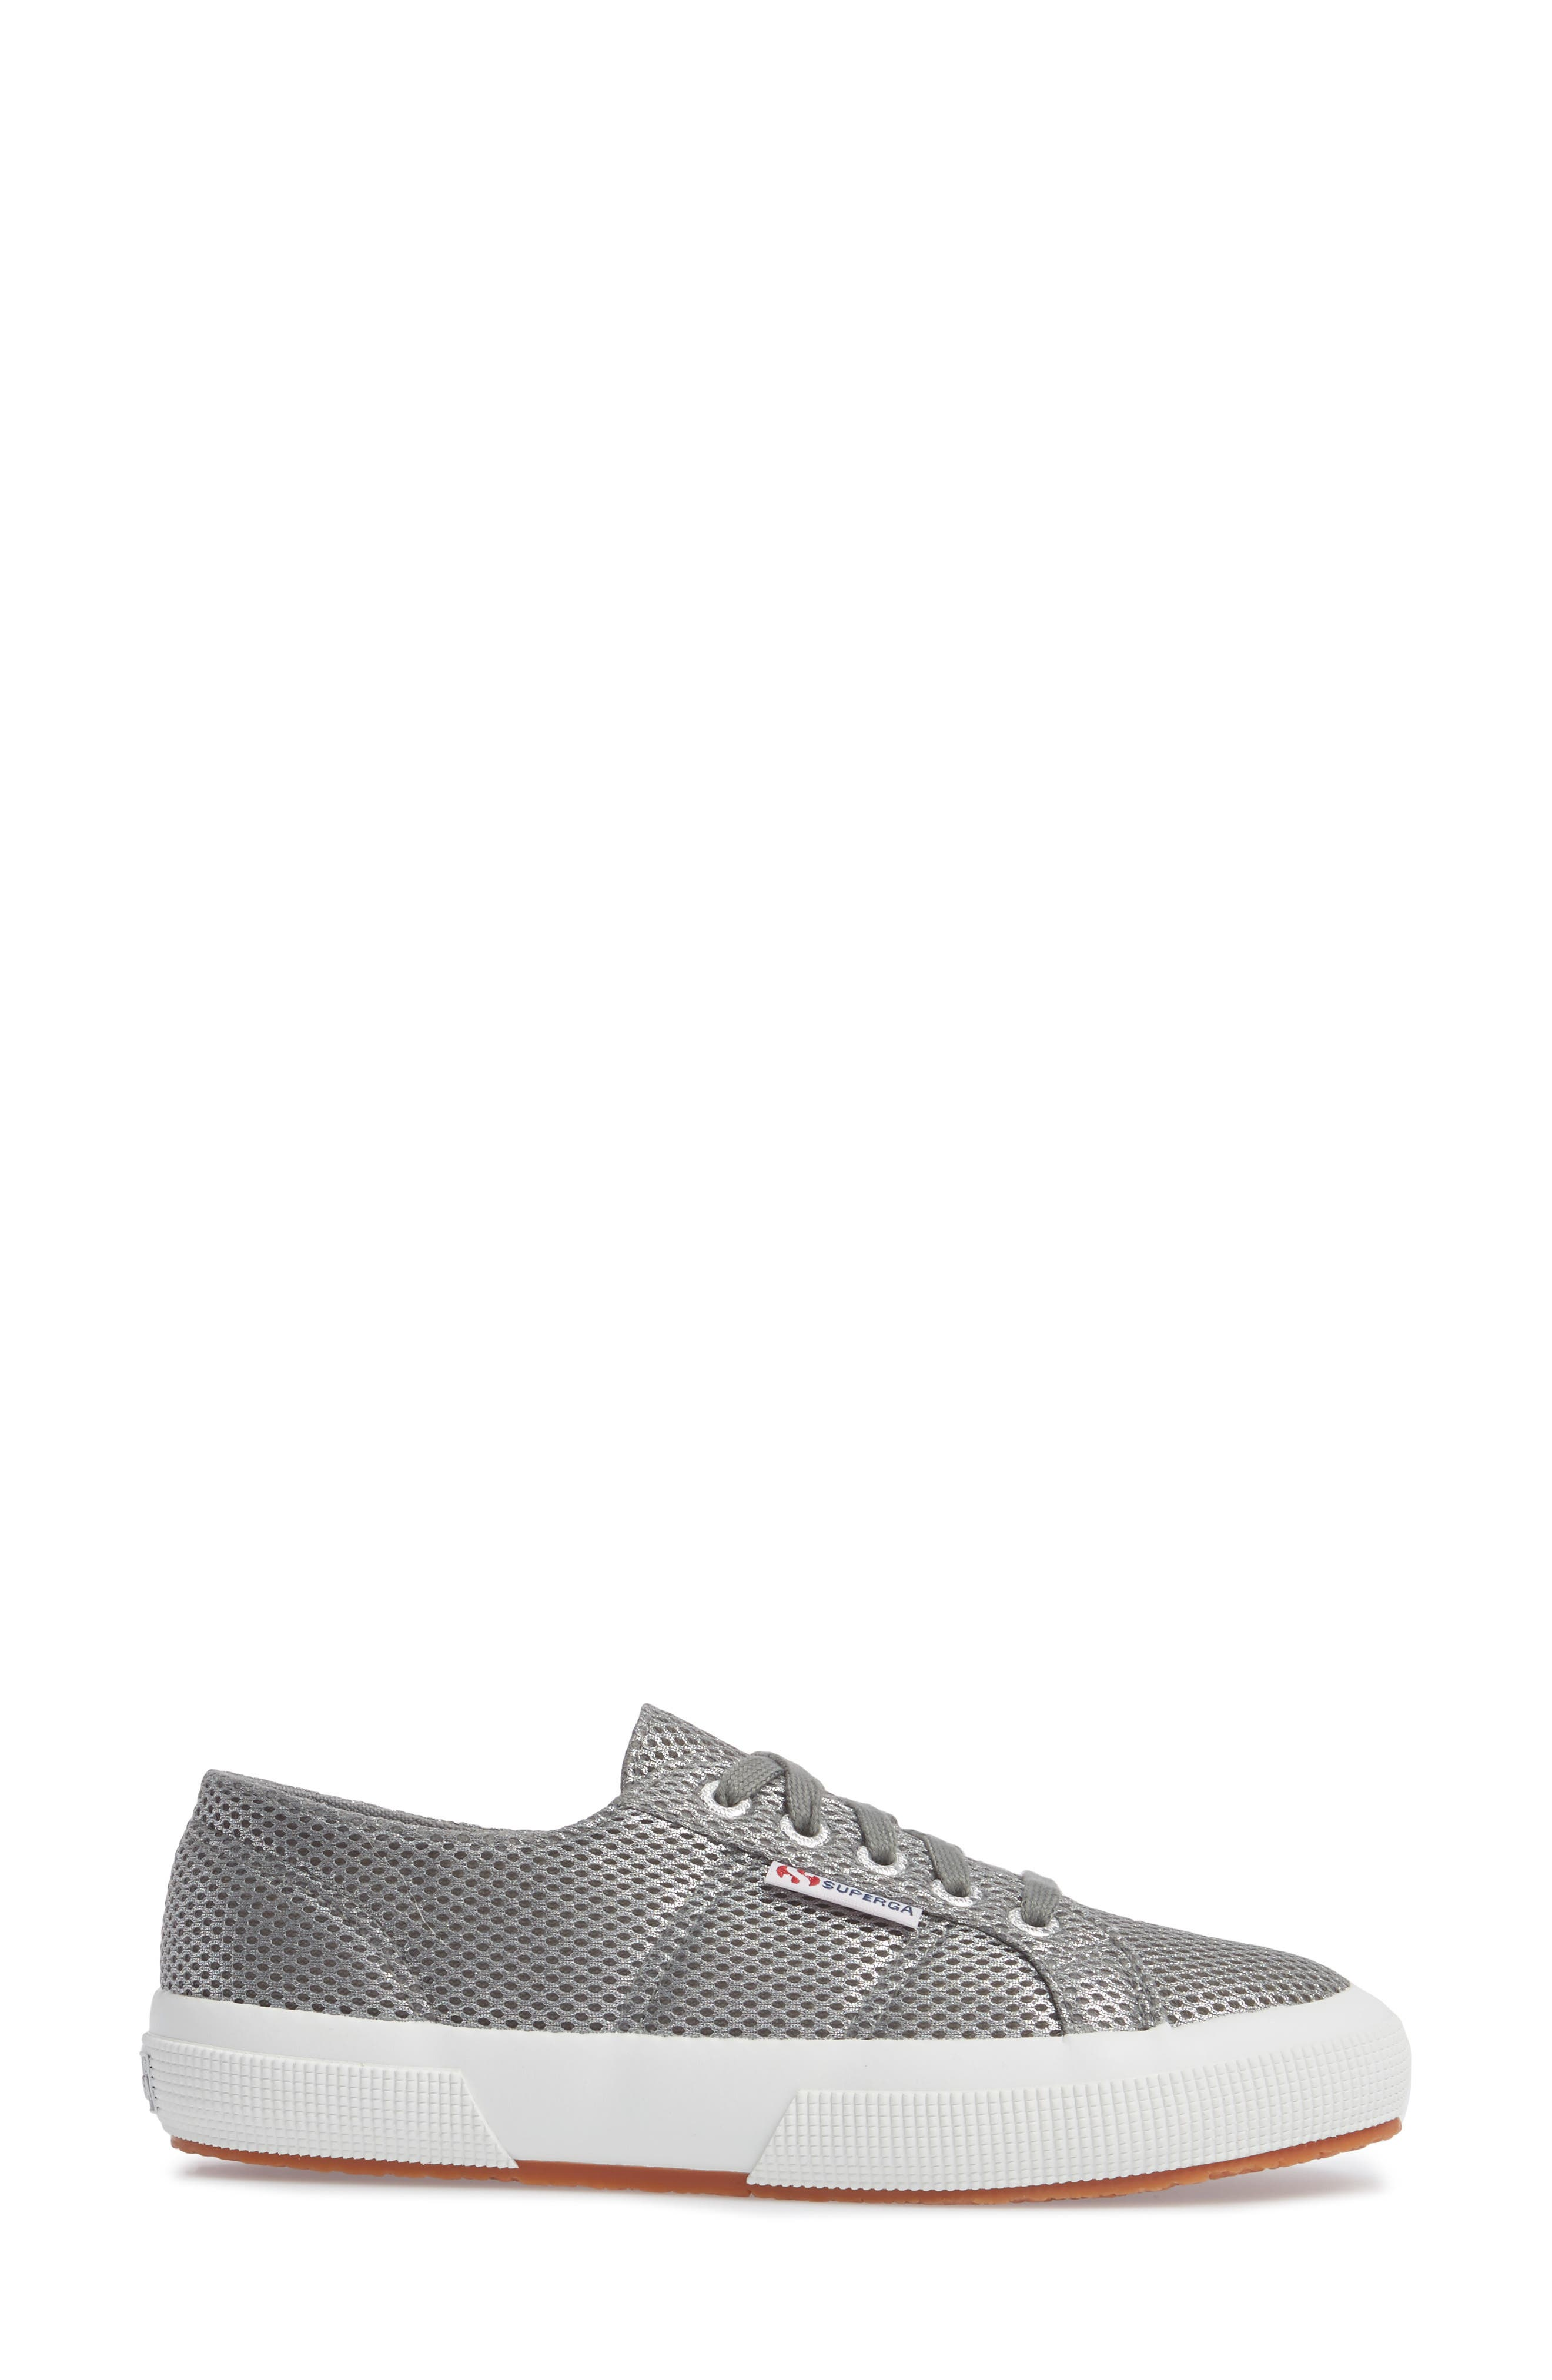 2750 Metallic Sneaker,                             Alternate thumbnail 3, color,                             044